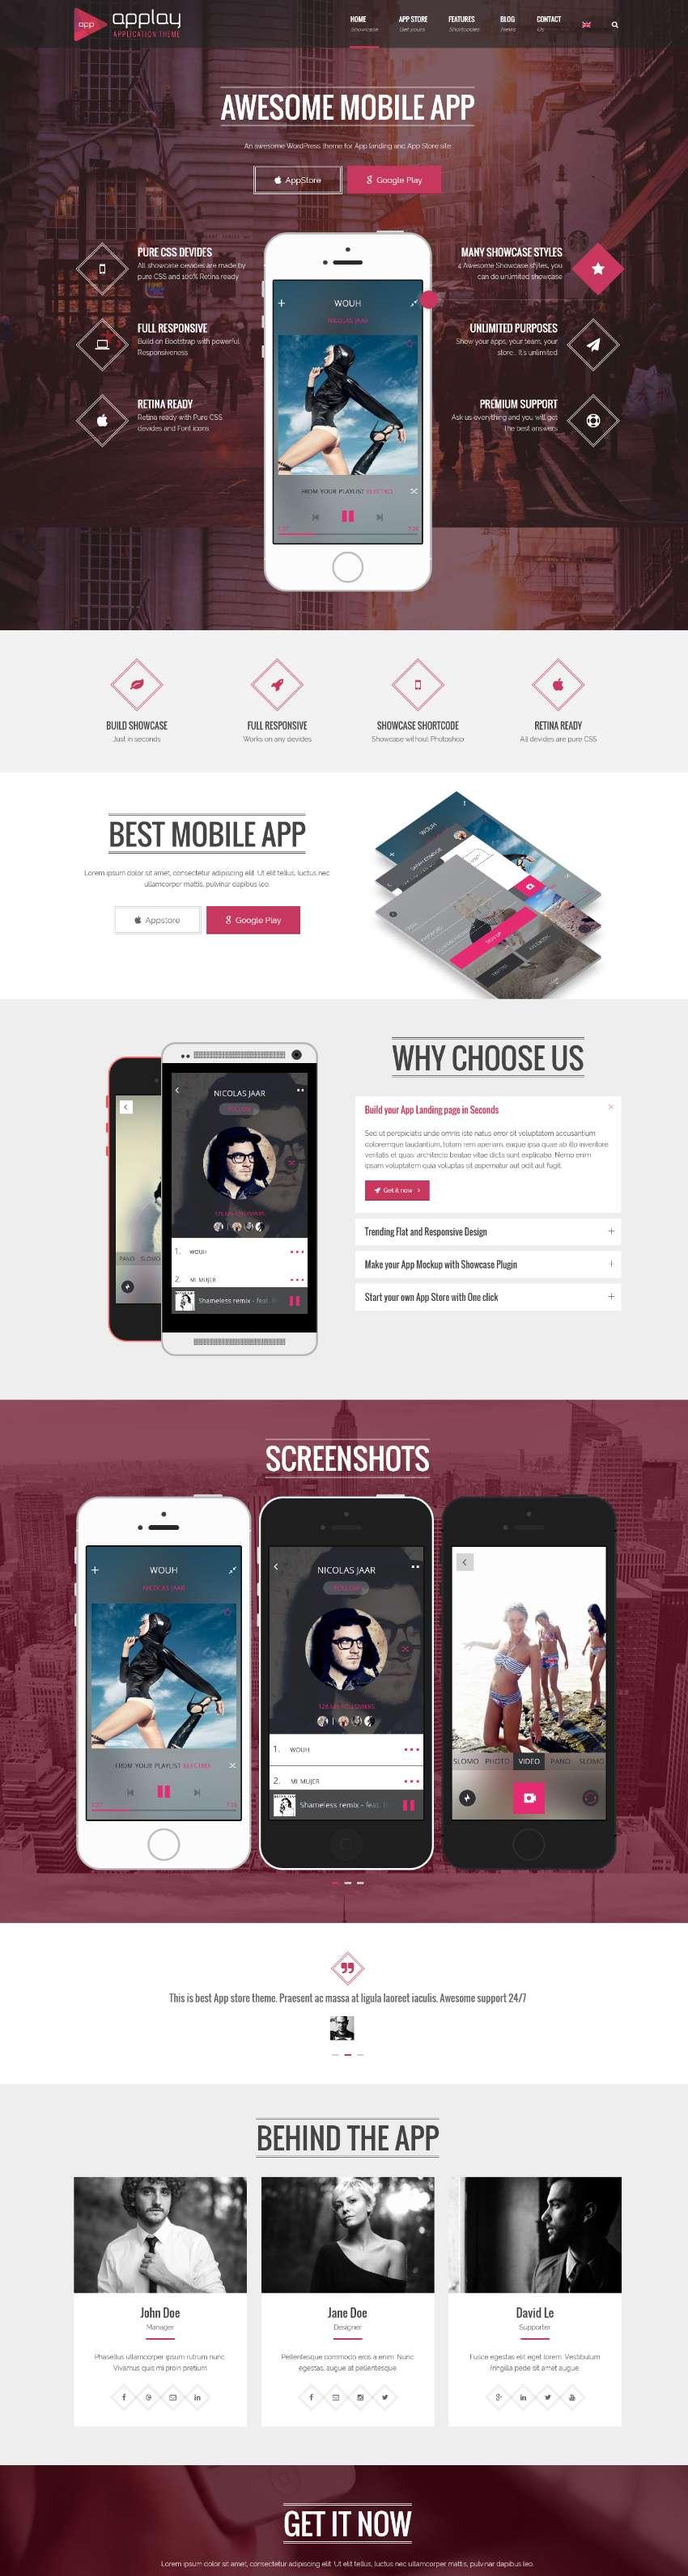 Applay - Wordpress App Showcase & App Store Theme